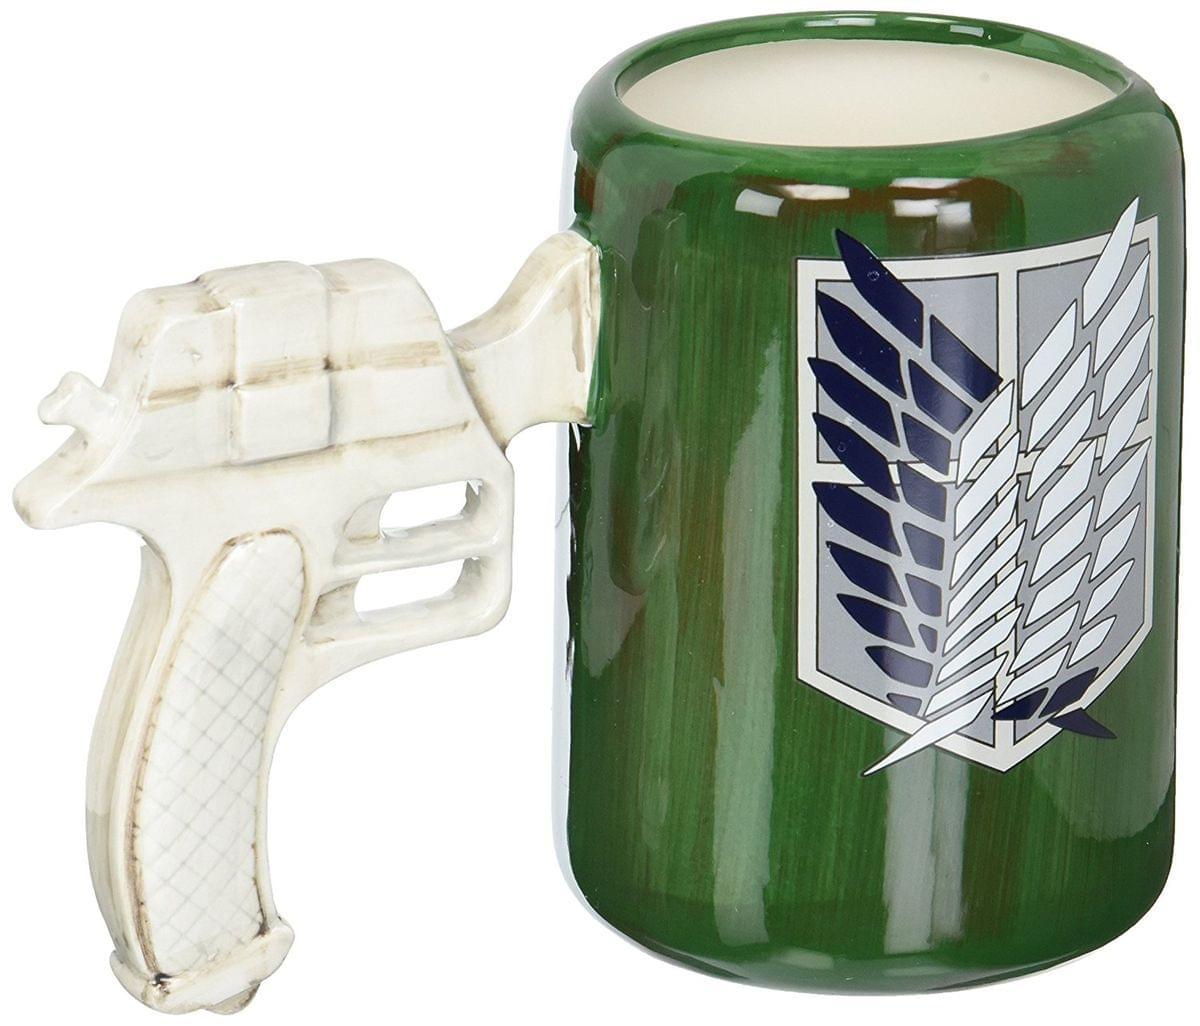 Attack on Titan: 3D Maneuvering Gear Handle Molded Mug